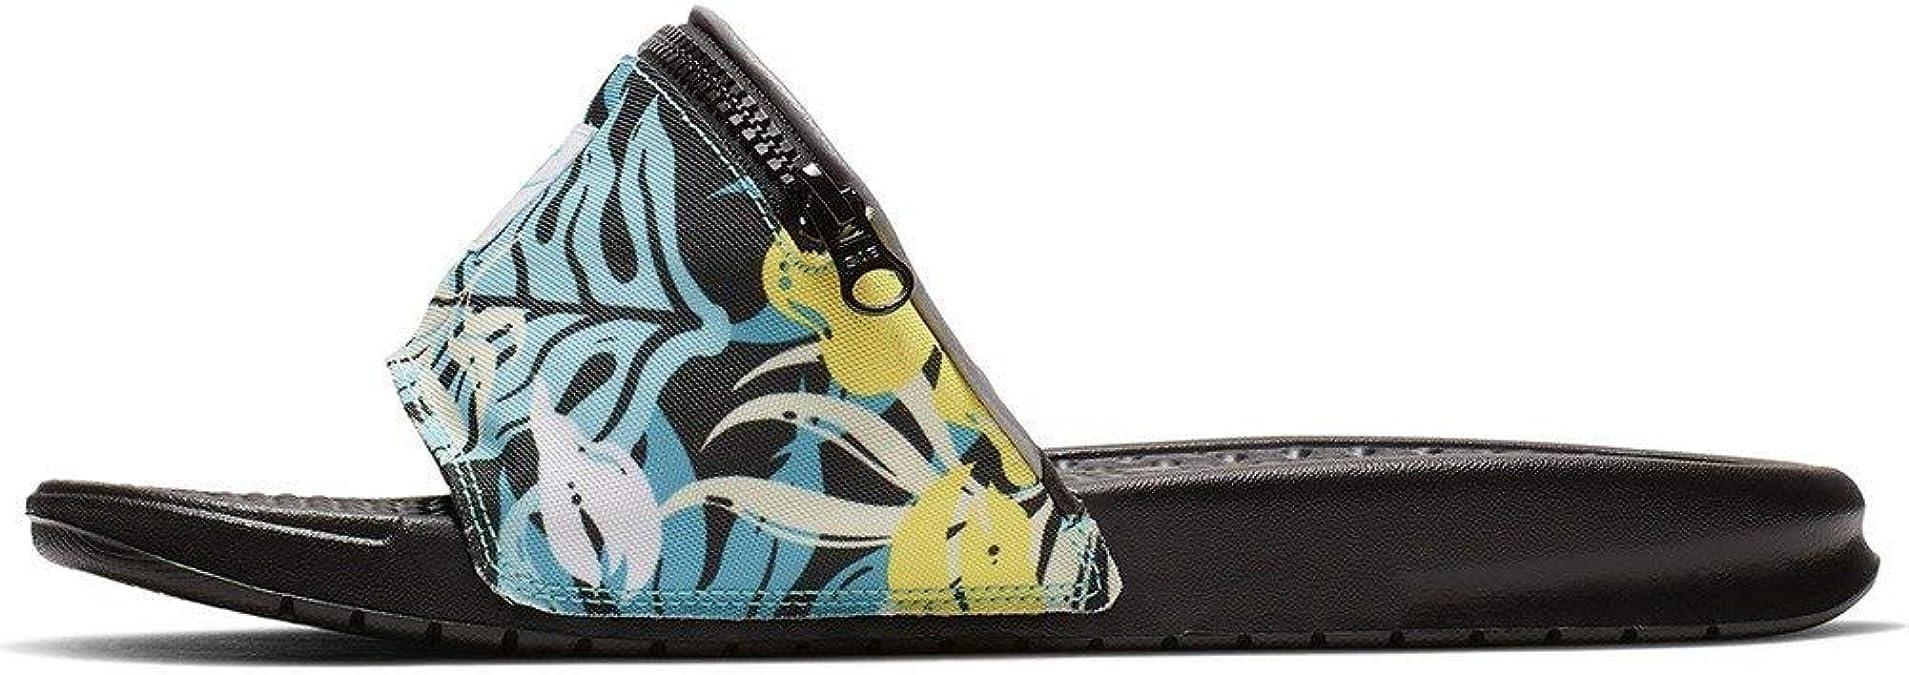 Chanclas Nike Benassi JDI Fanny Pack Print Turquesa 36: Amazon.es: Zapatos y complementos